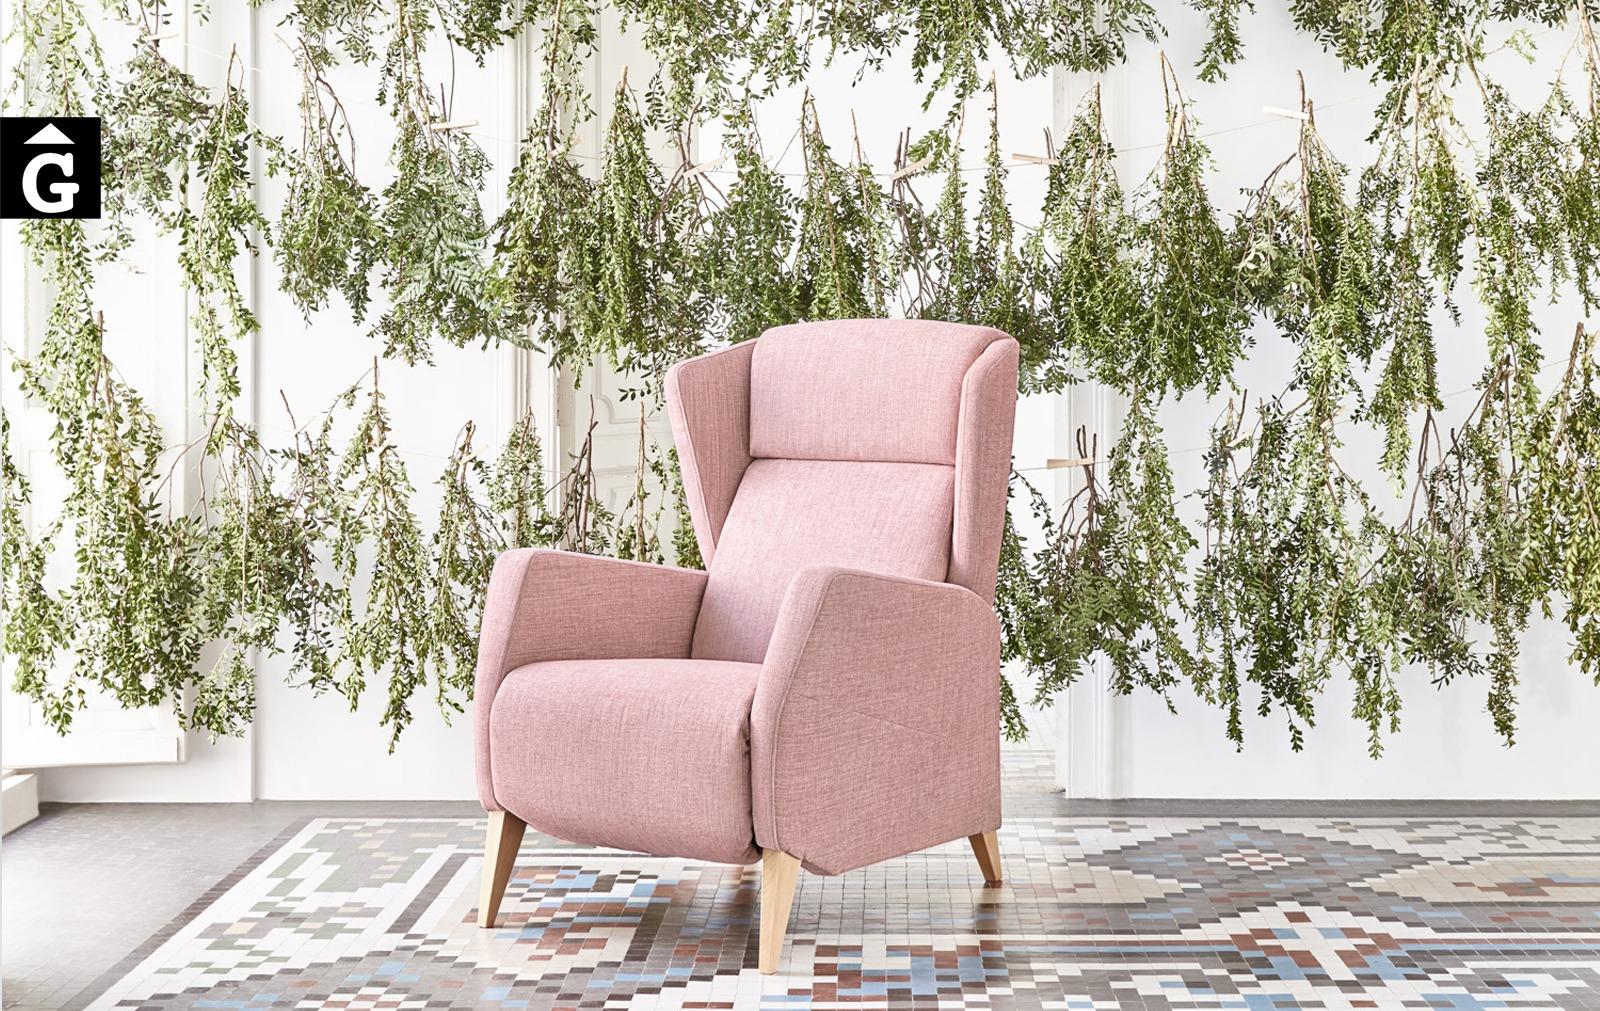 Butaca relax motor o manual Spok 1 Tajoma by mobles Gifreu tapisseria de disseny actual i classic relax butaques sillons